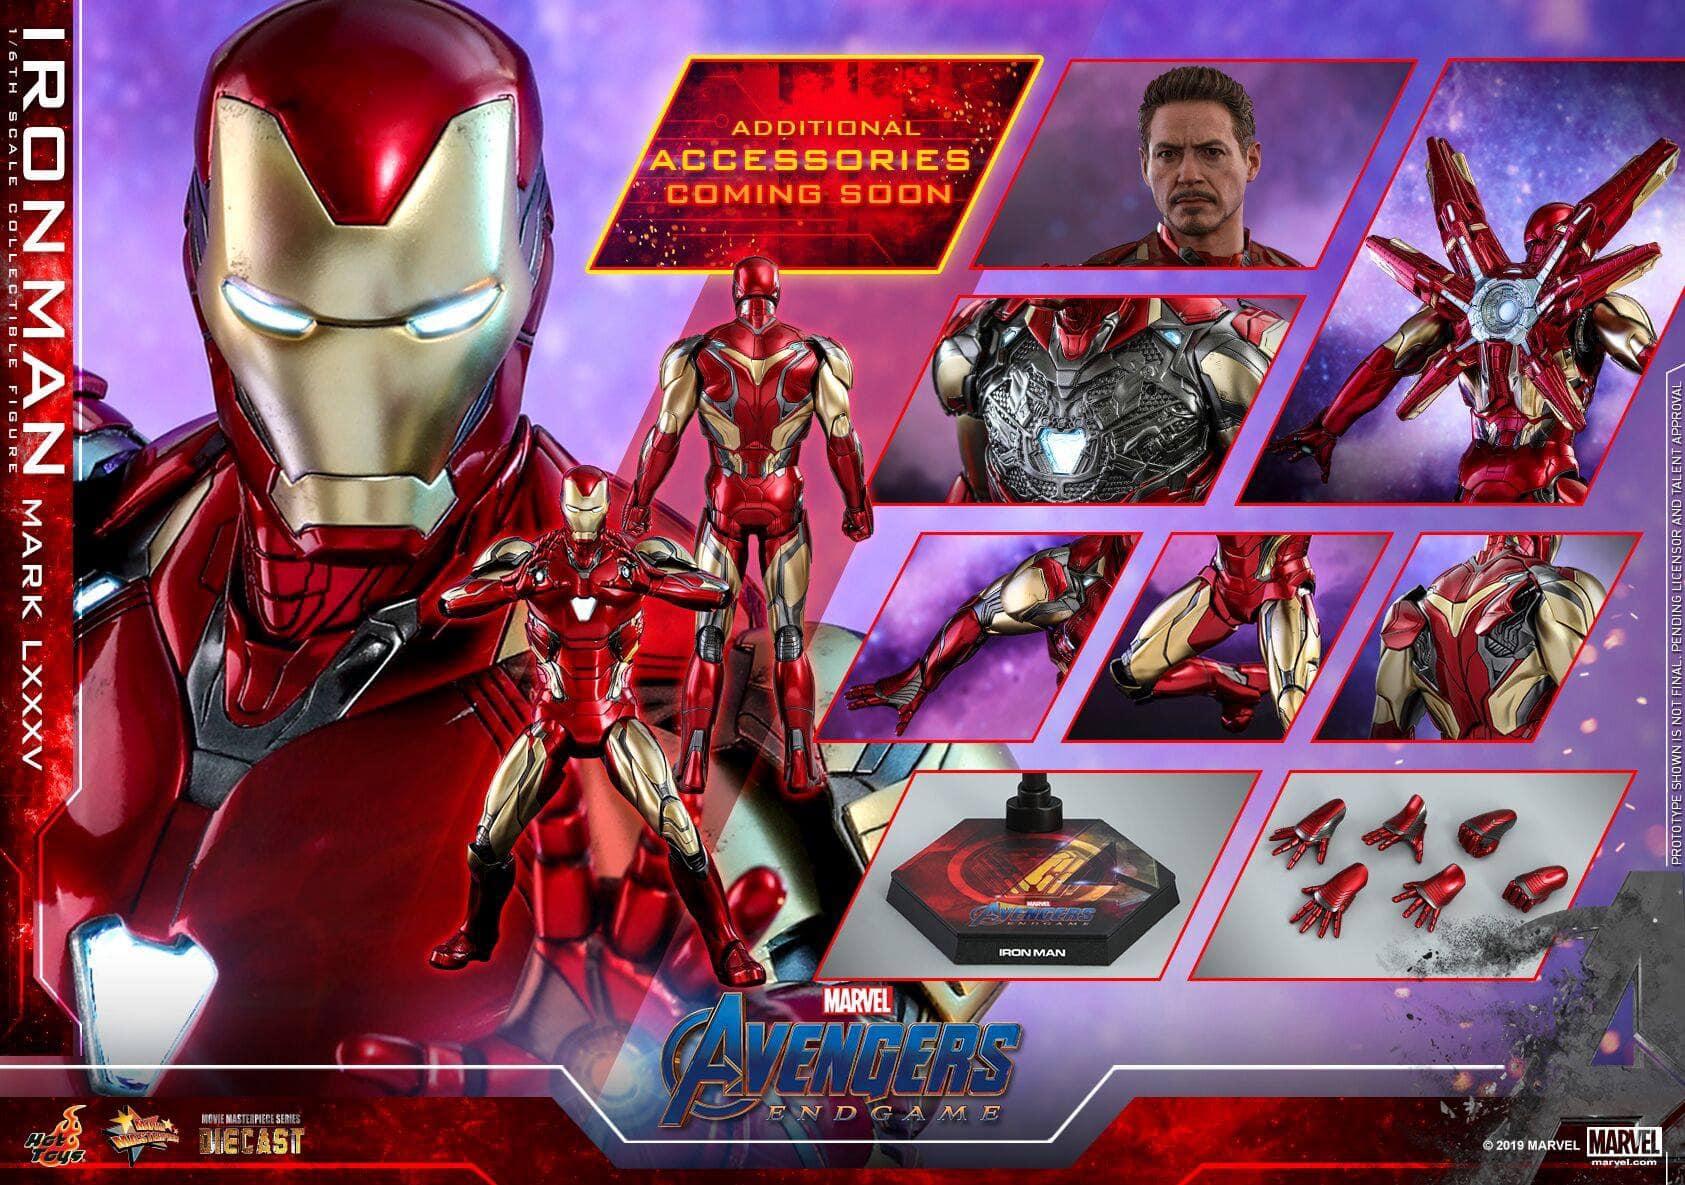 Tacho-Iron Man Mark LXXXV /& Rescue Marvel Los Vengadores Hot Toys Cosbaby